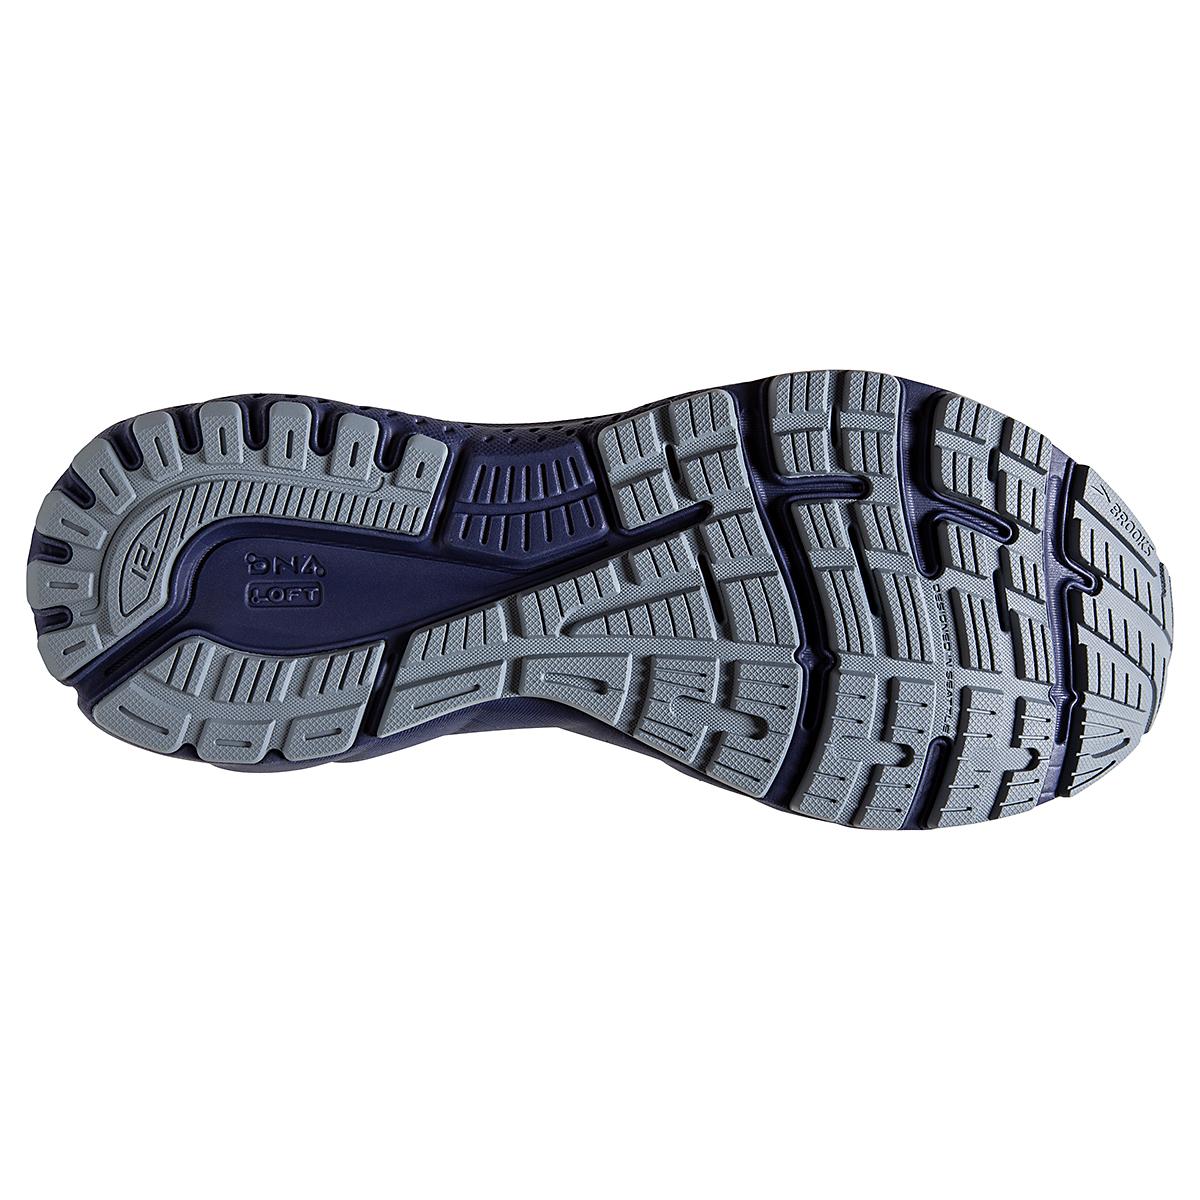 Men's Brooks Adrenaline GTS 21 Running Shoe - Color: Grey/Tradewinds - Size: 7 - Width: Regular, Grey/Tradewinds, large, image 6